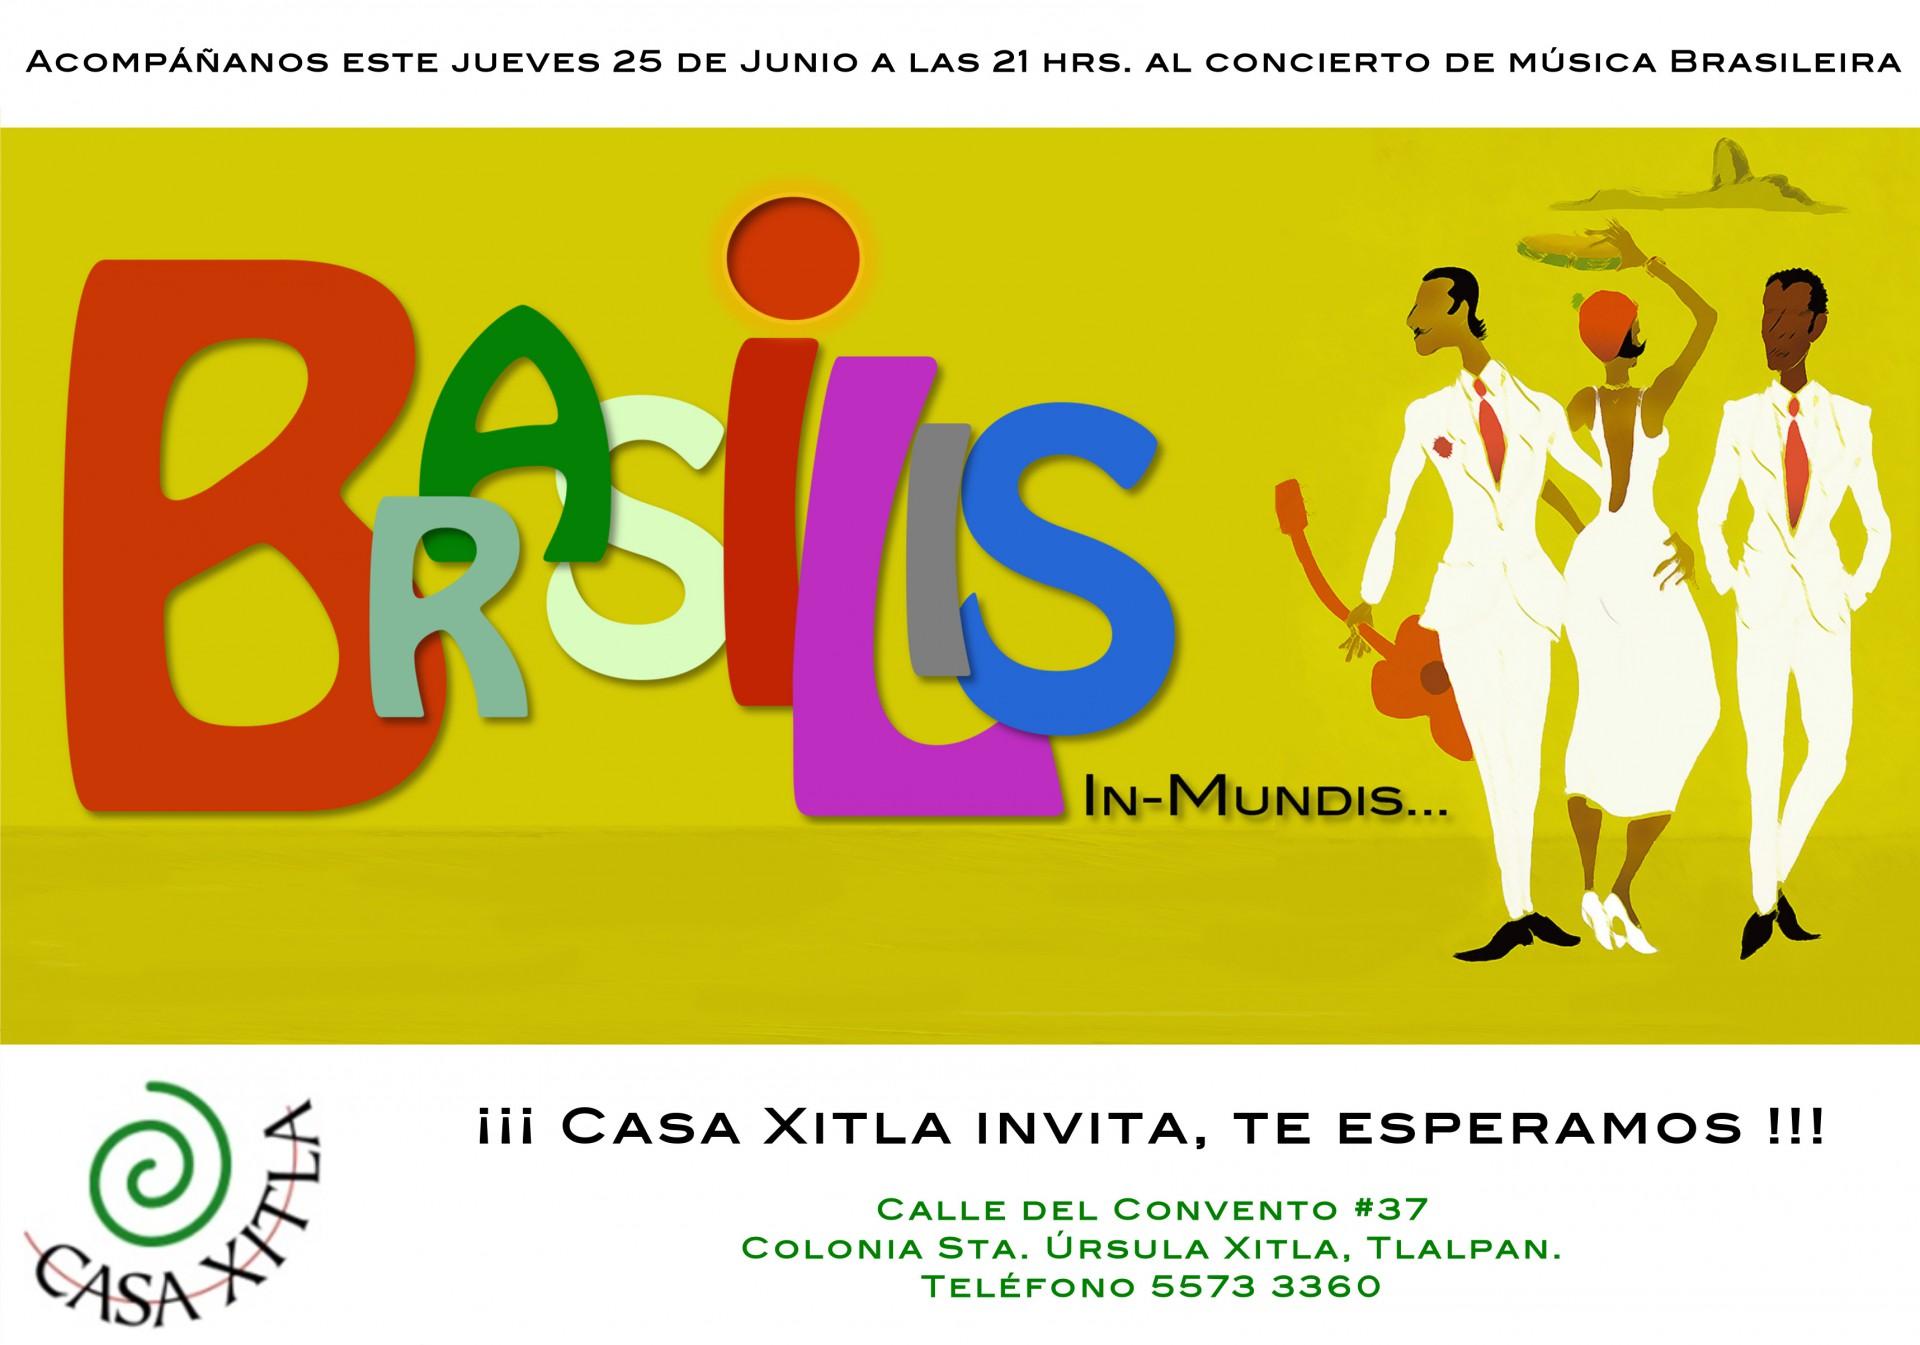 Microsoft Word - Invitacion Concierto Brasilis in-mundis.docx